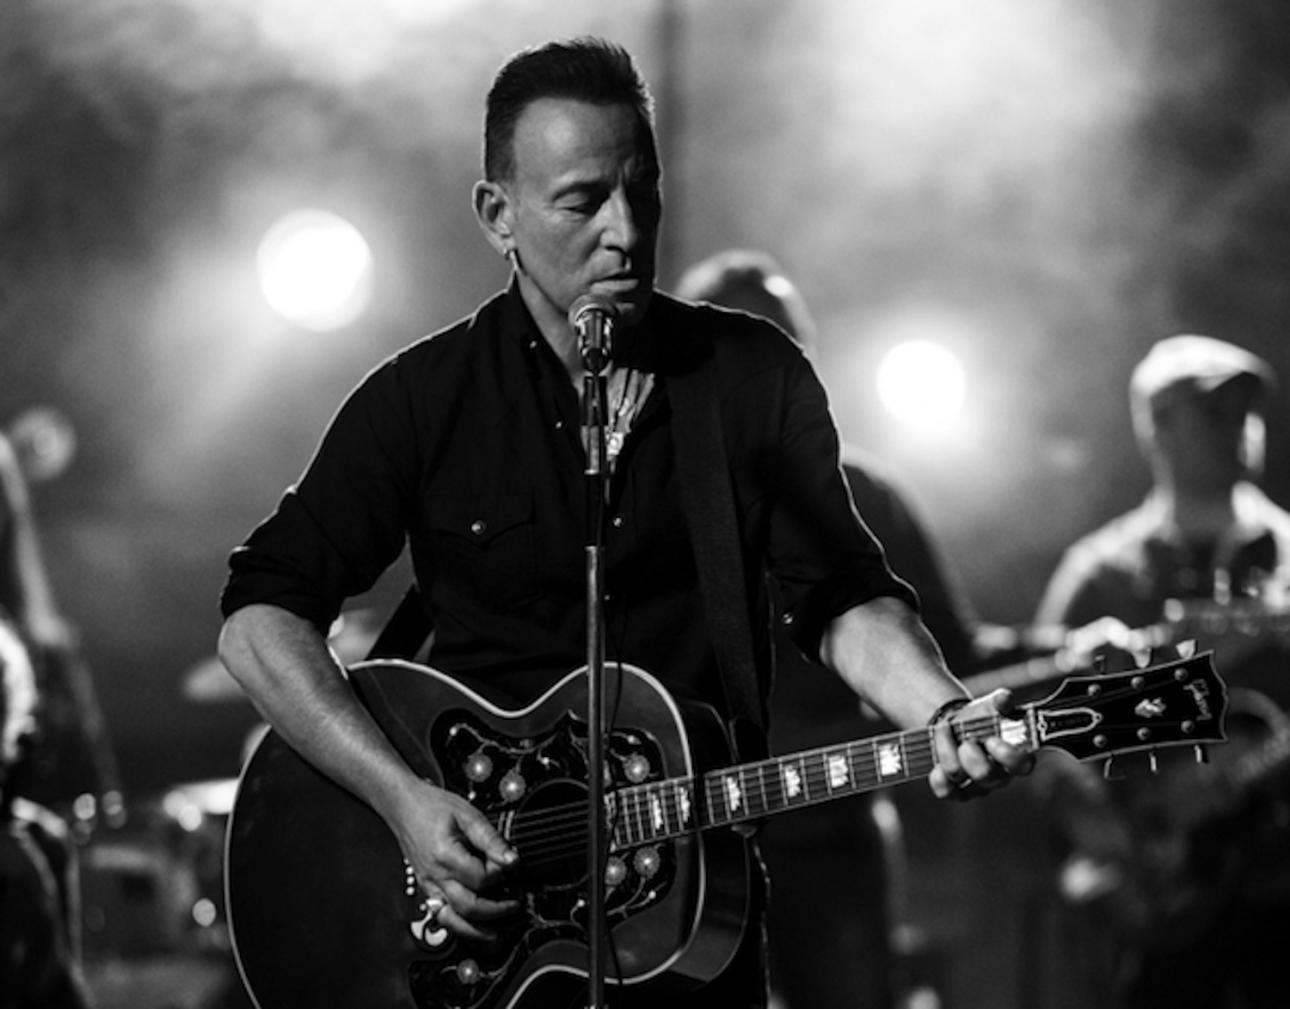 Bruce Springsteen to host SiriusXM radio show tomorrow